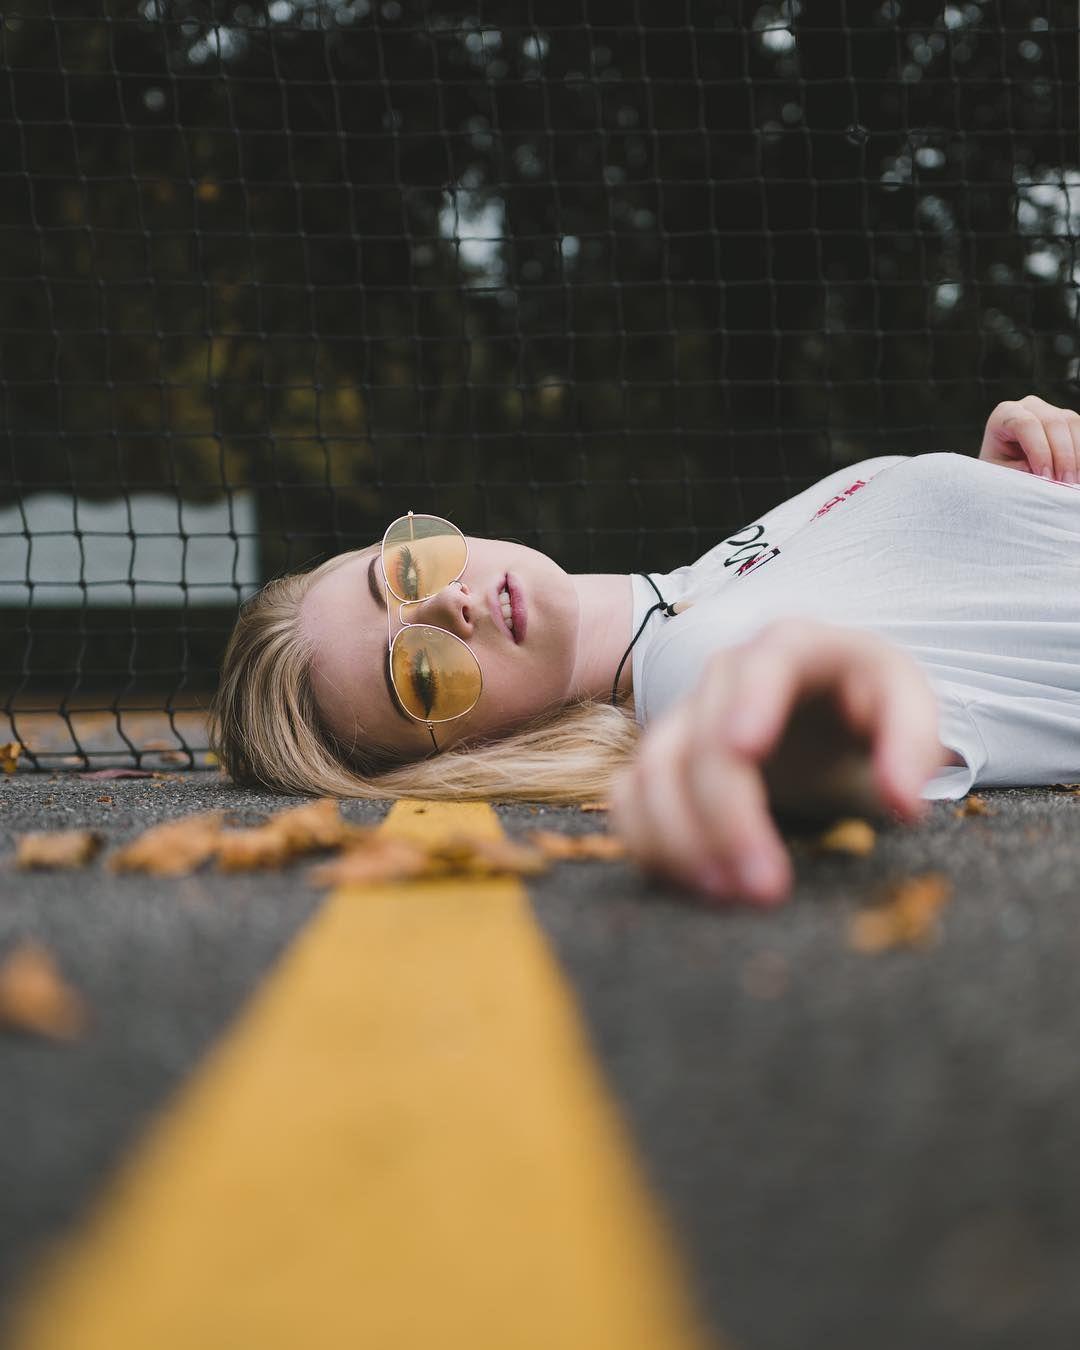 Chica acostada en la calle pretty photography portrait